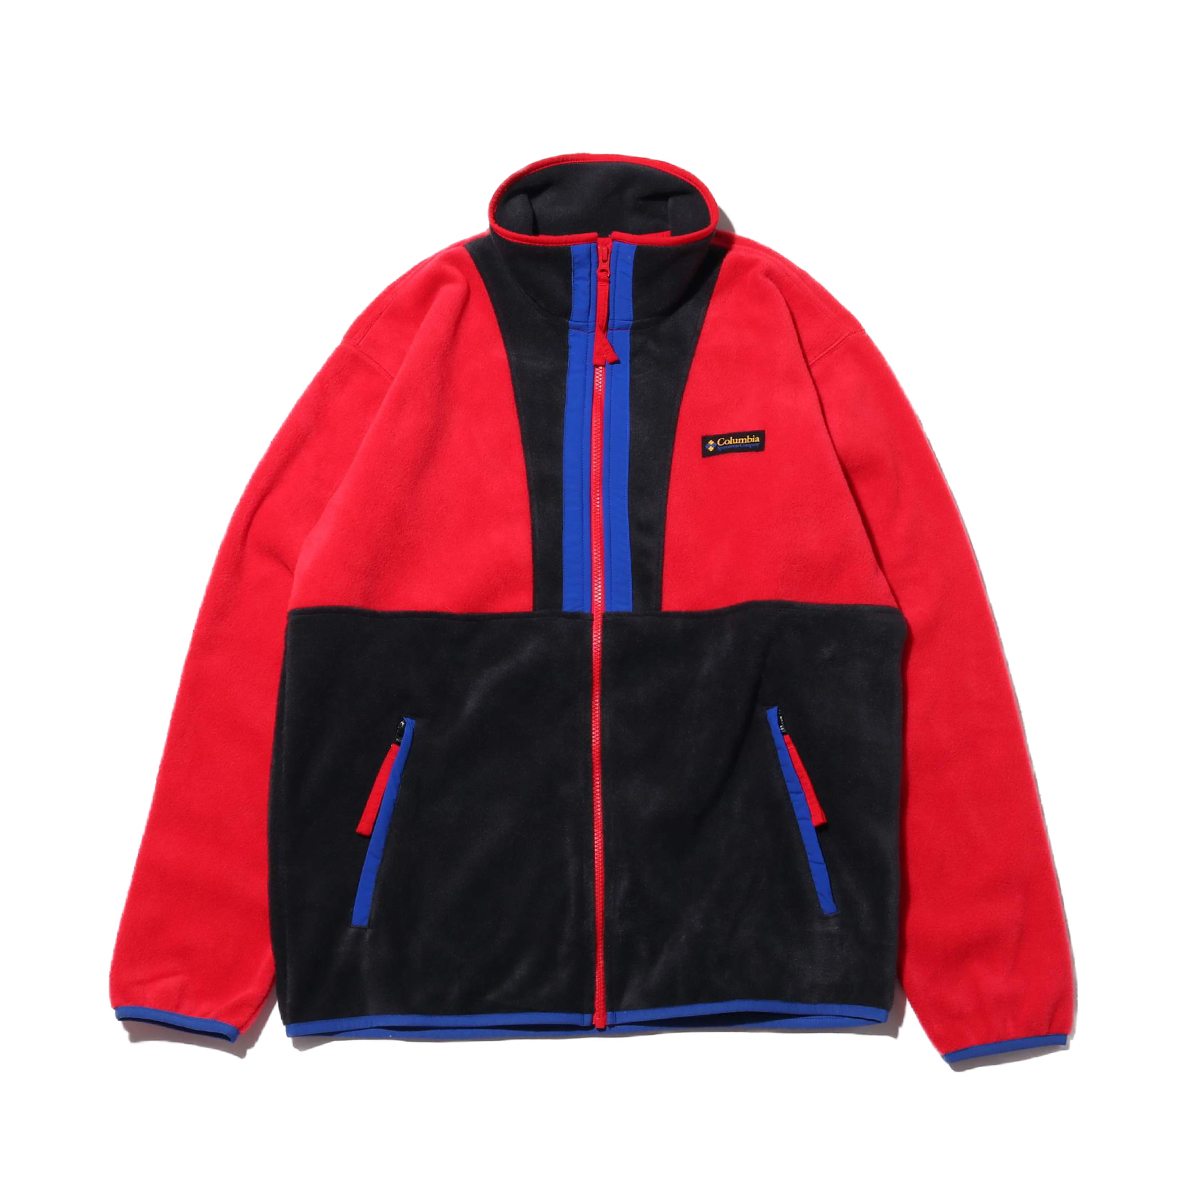 Columbia Back Bowl™ Full Zip Fleece(Mountain Red, Black, Azul)(コロンビア バックボール フルジップ フリース)【メンズ】【フリース】【19FA-I】